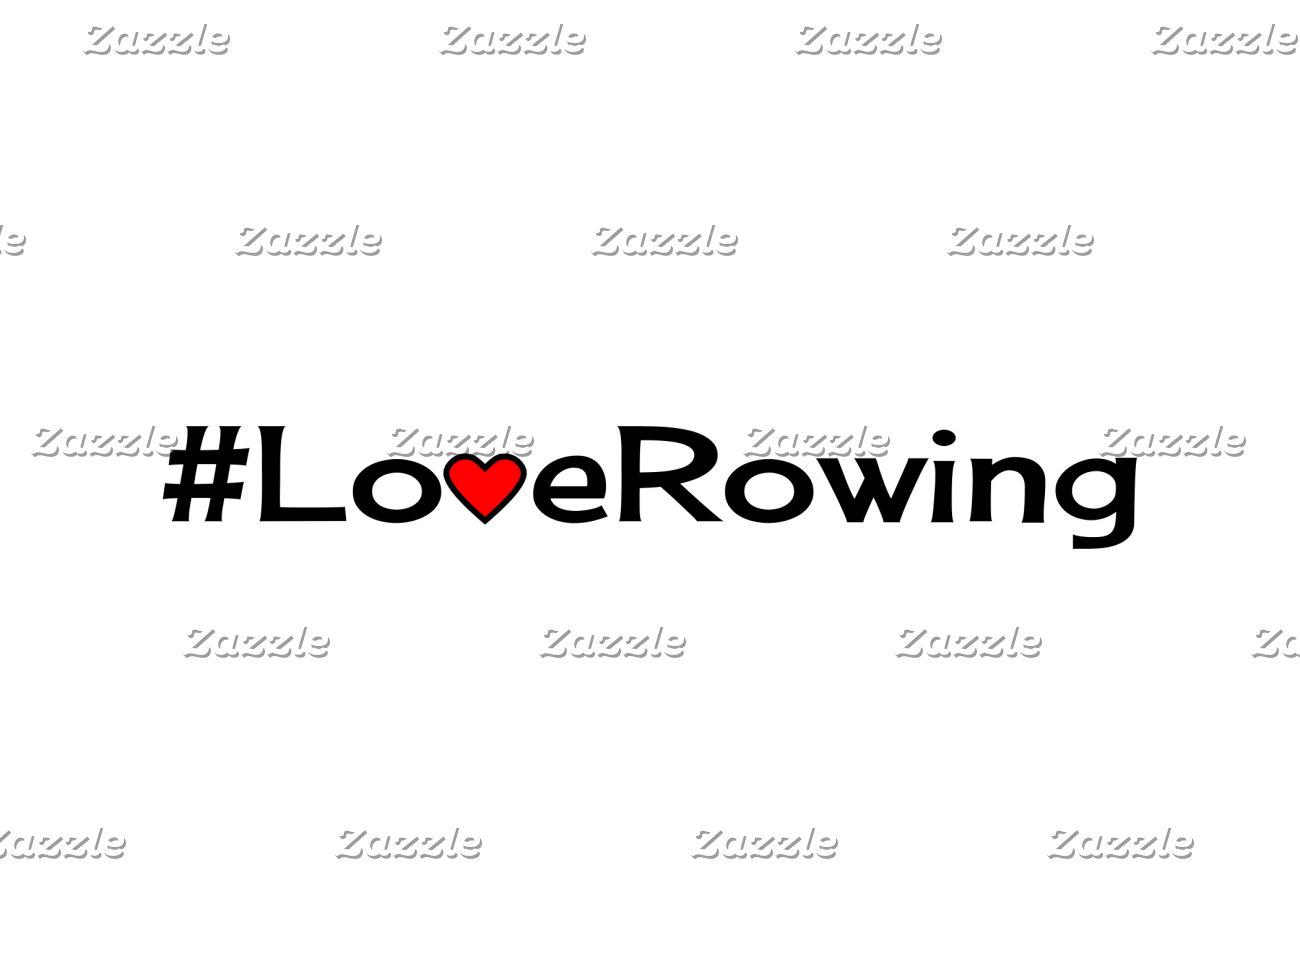 Love Rowing